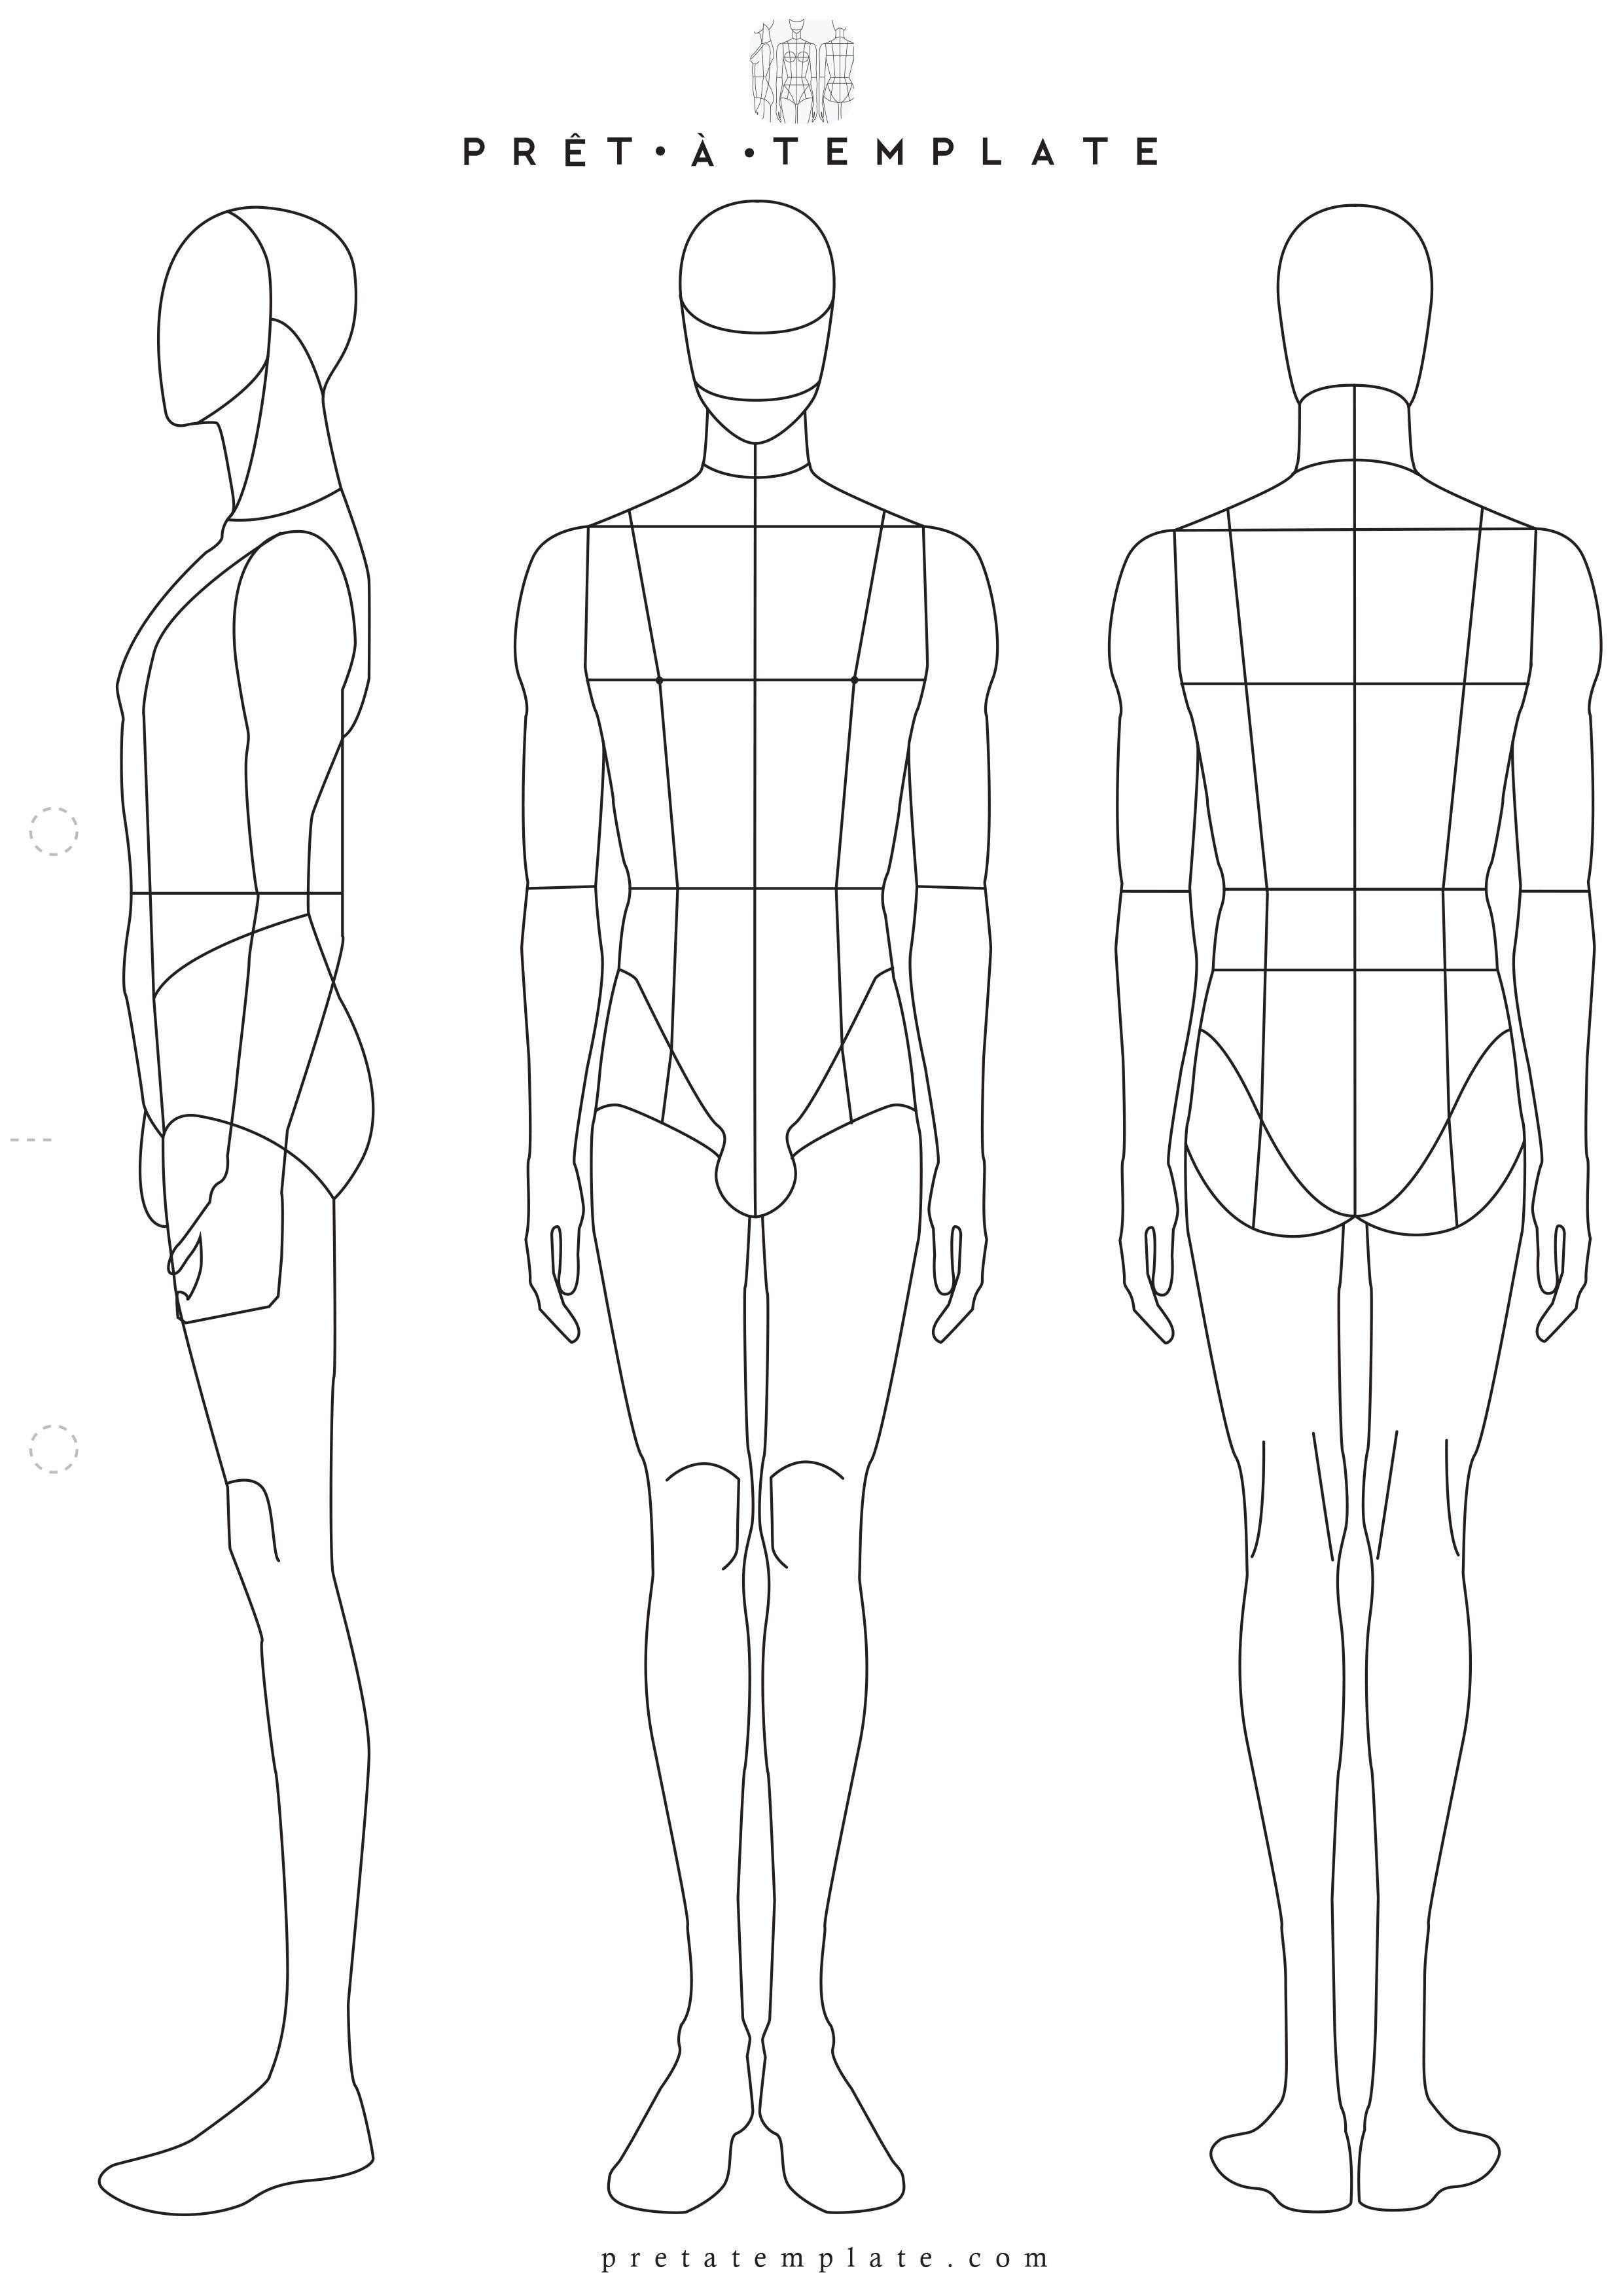 Man Male Body Figure Fashion Template D I Y Your Own Fashion Sketchbook Keywo Fashion Illustration Template Fashion Design Template Fashion Figure Templates